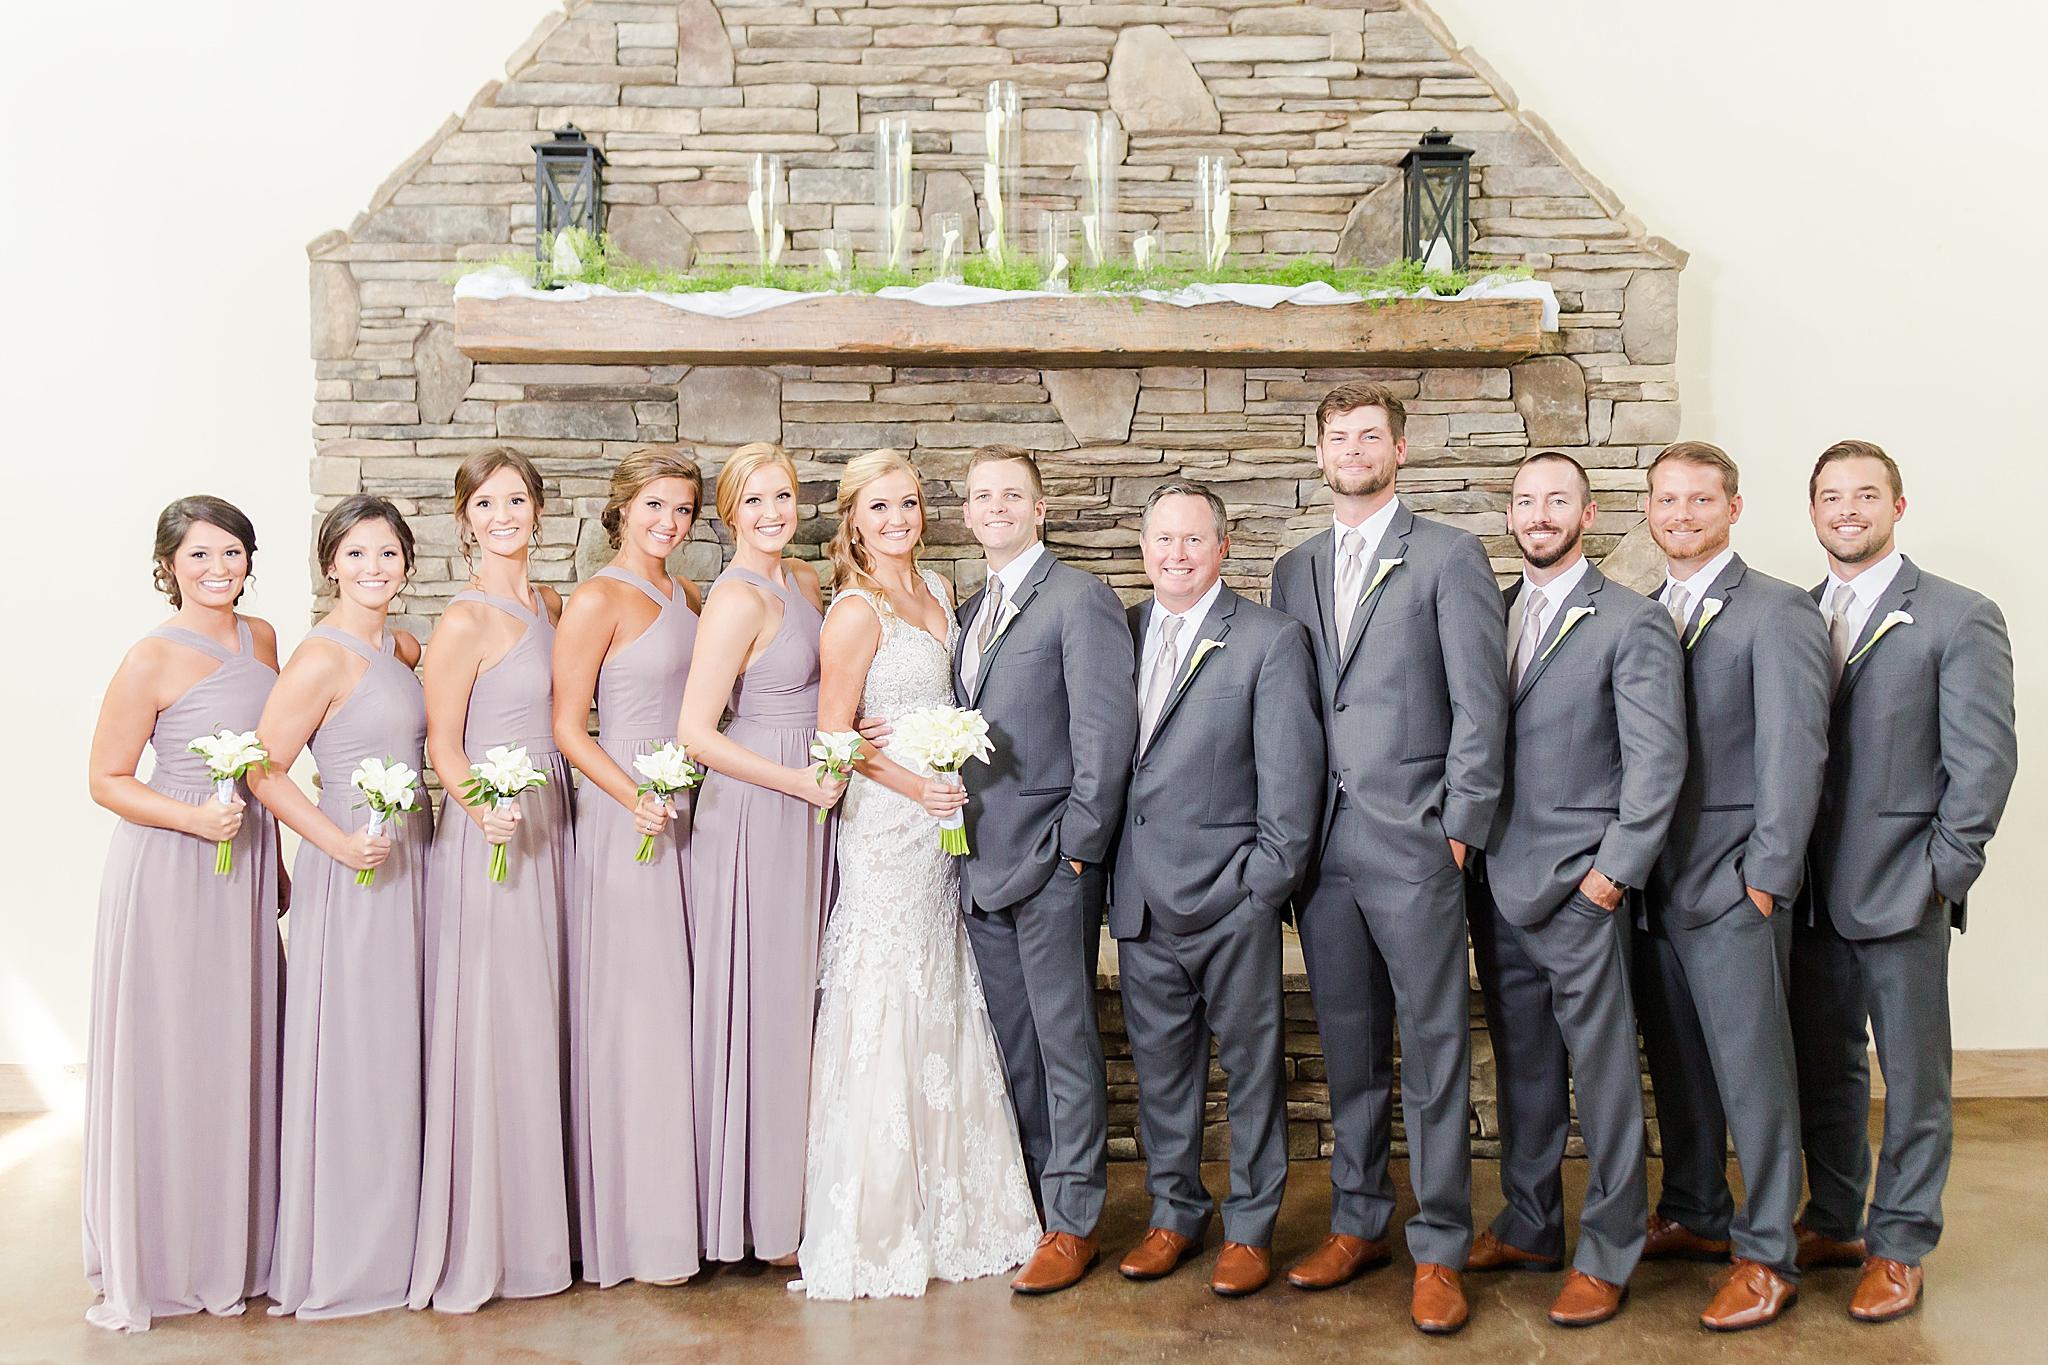 bridal party poses by stone chimney at Izenstone